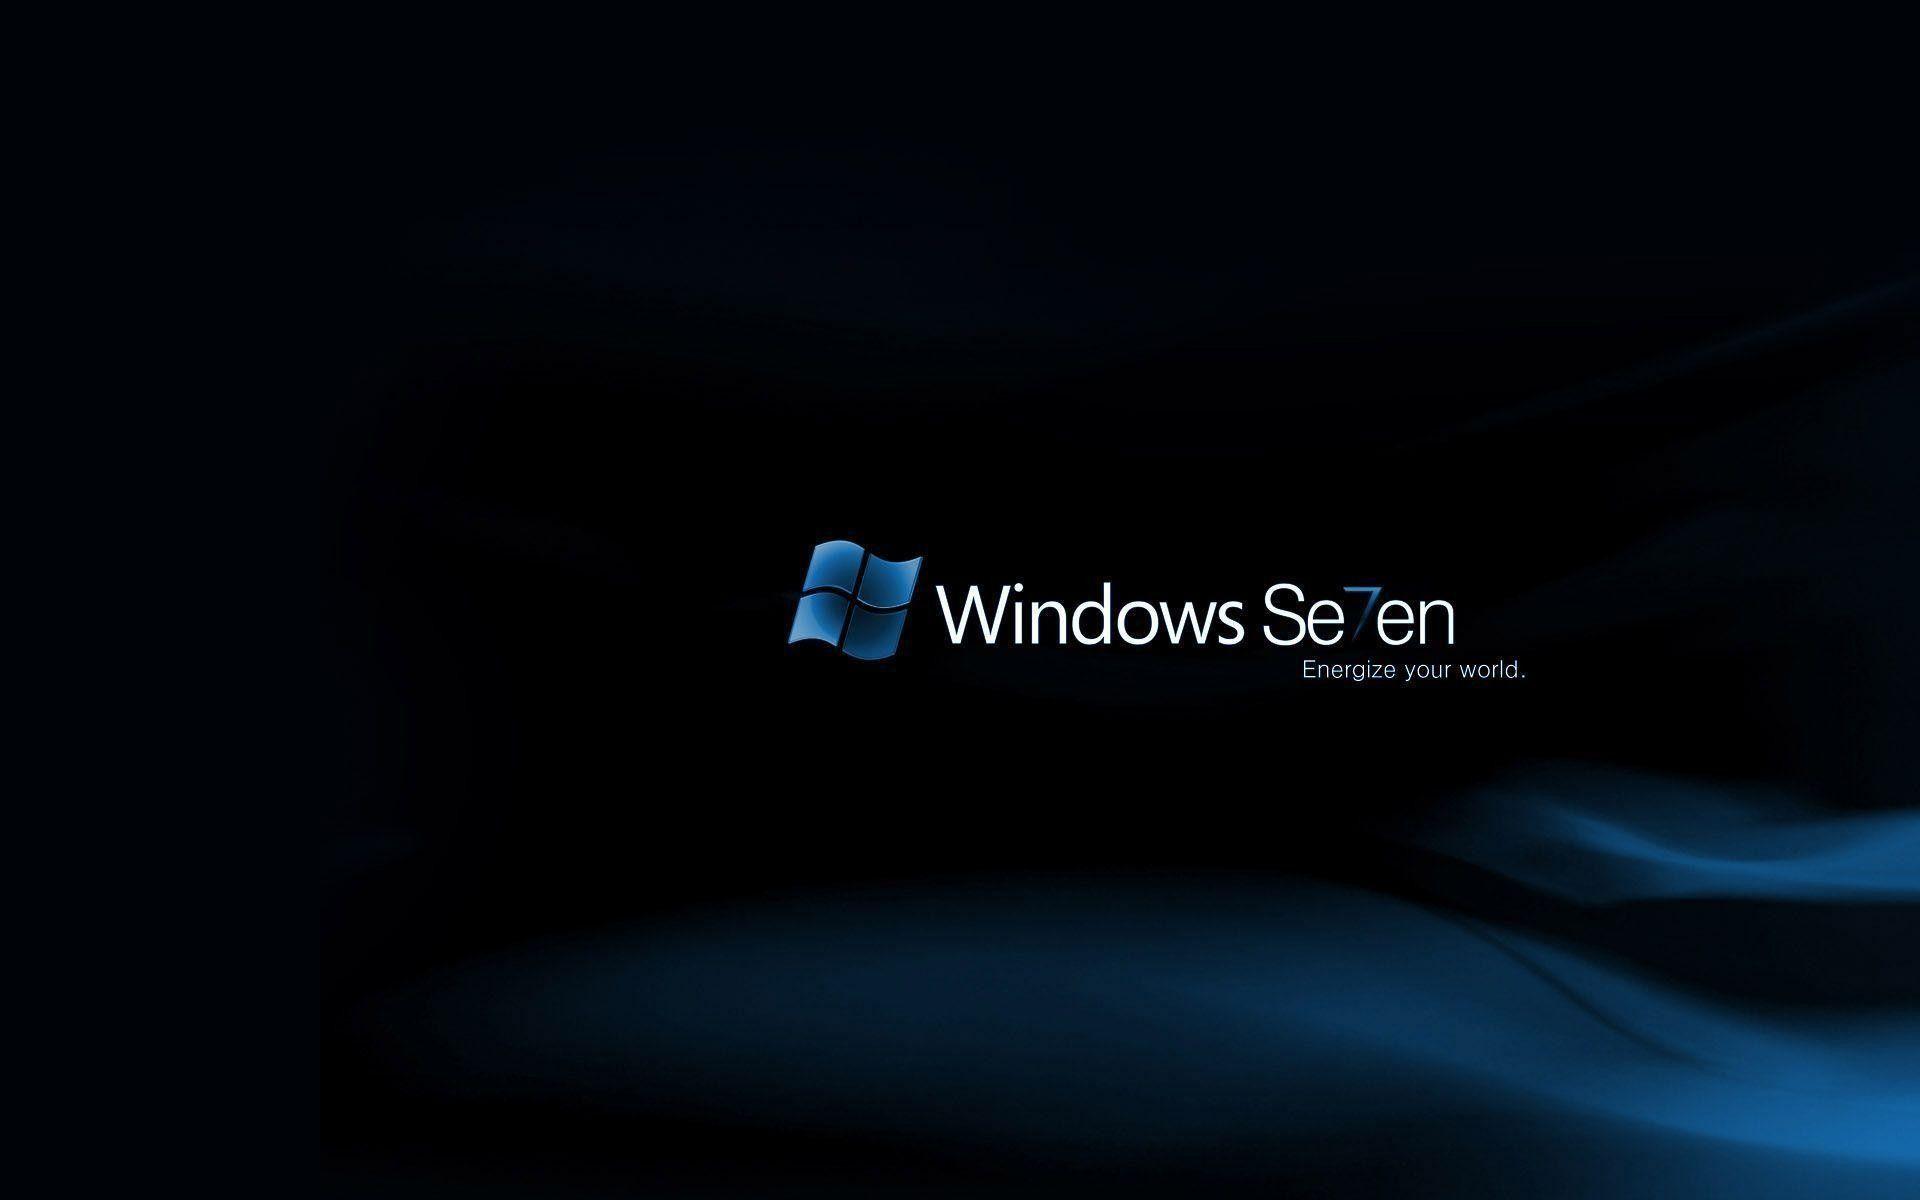 Fresh Download Desktop Background For Windows 7 Ultimate Cool Wallpapers For Pc Desktop Wallpaper Desktop Themes